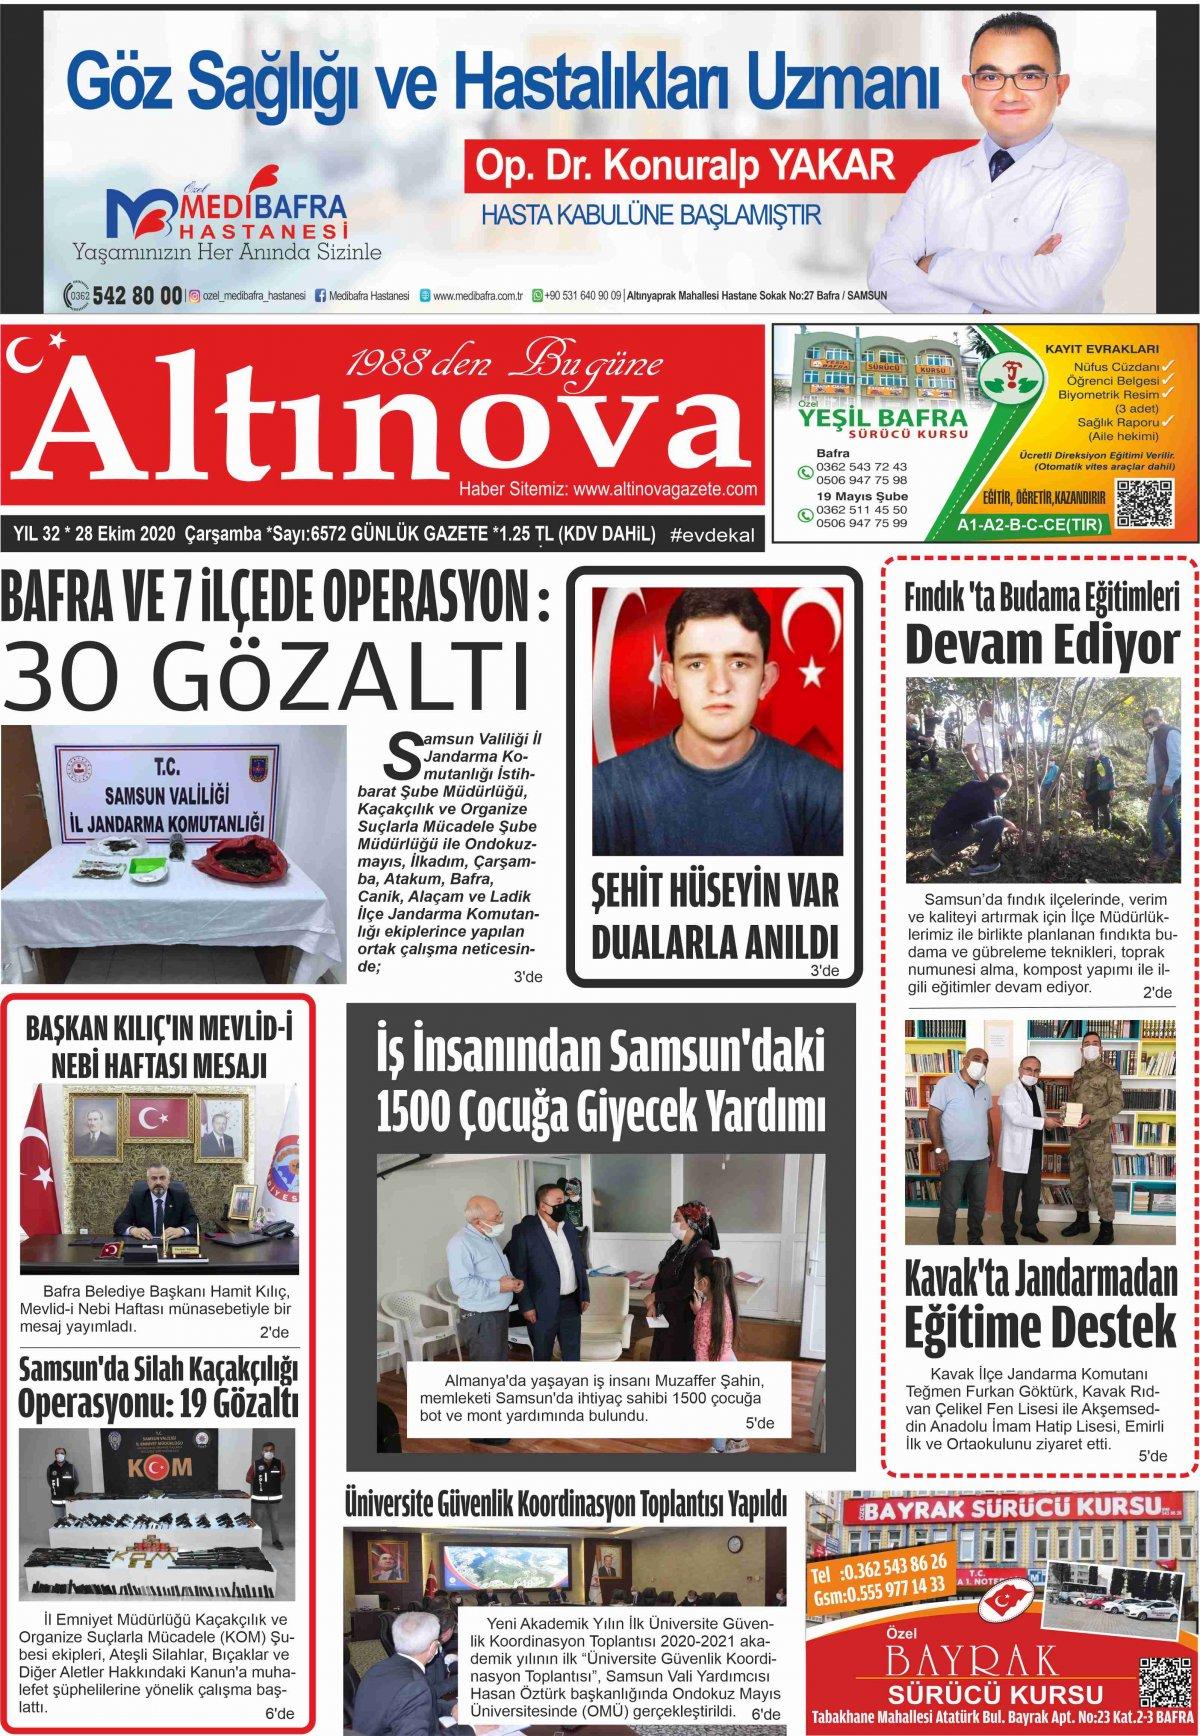 Bafra Haber, Bafrahaber, Bafra Haberleri, altinovagazete.com - 28.10.2020 Manşeti